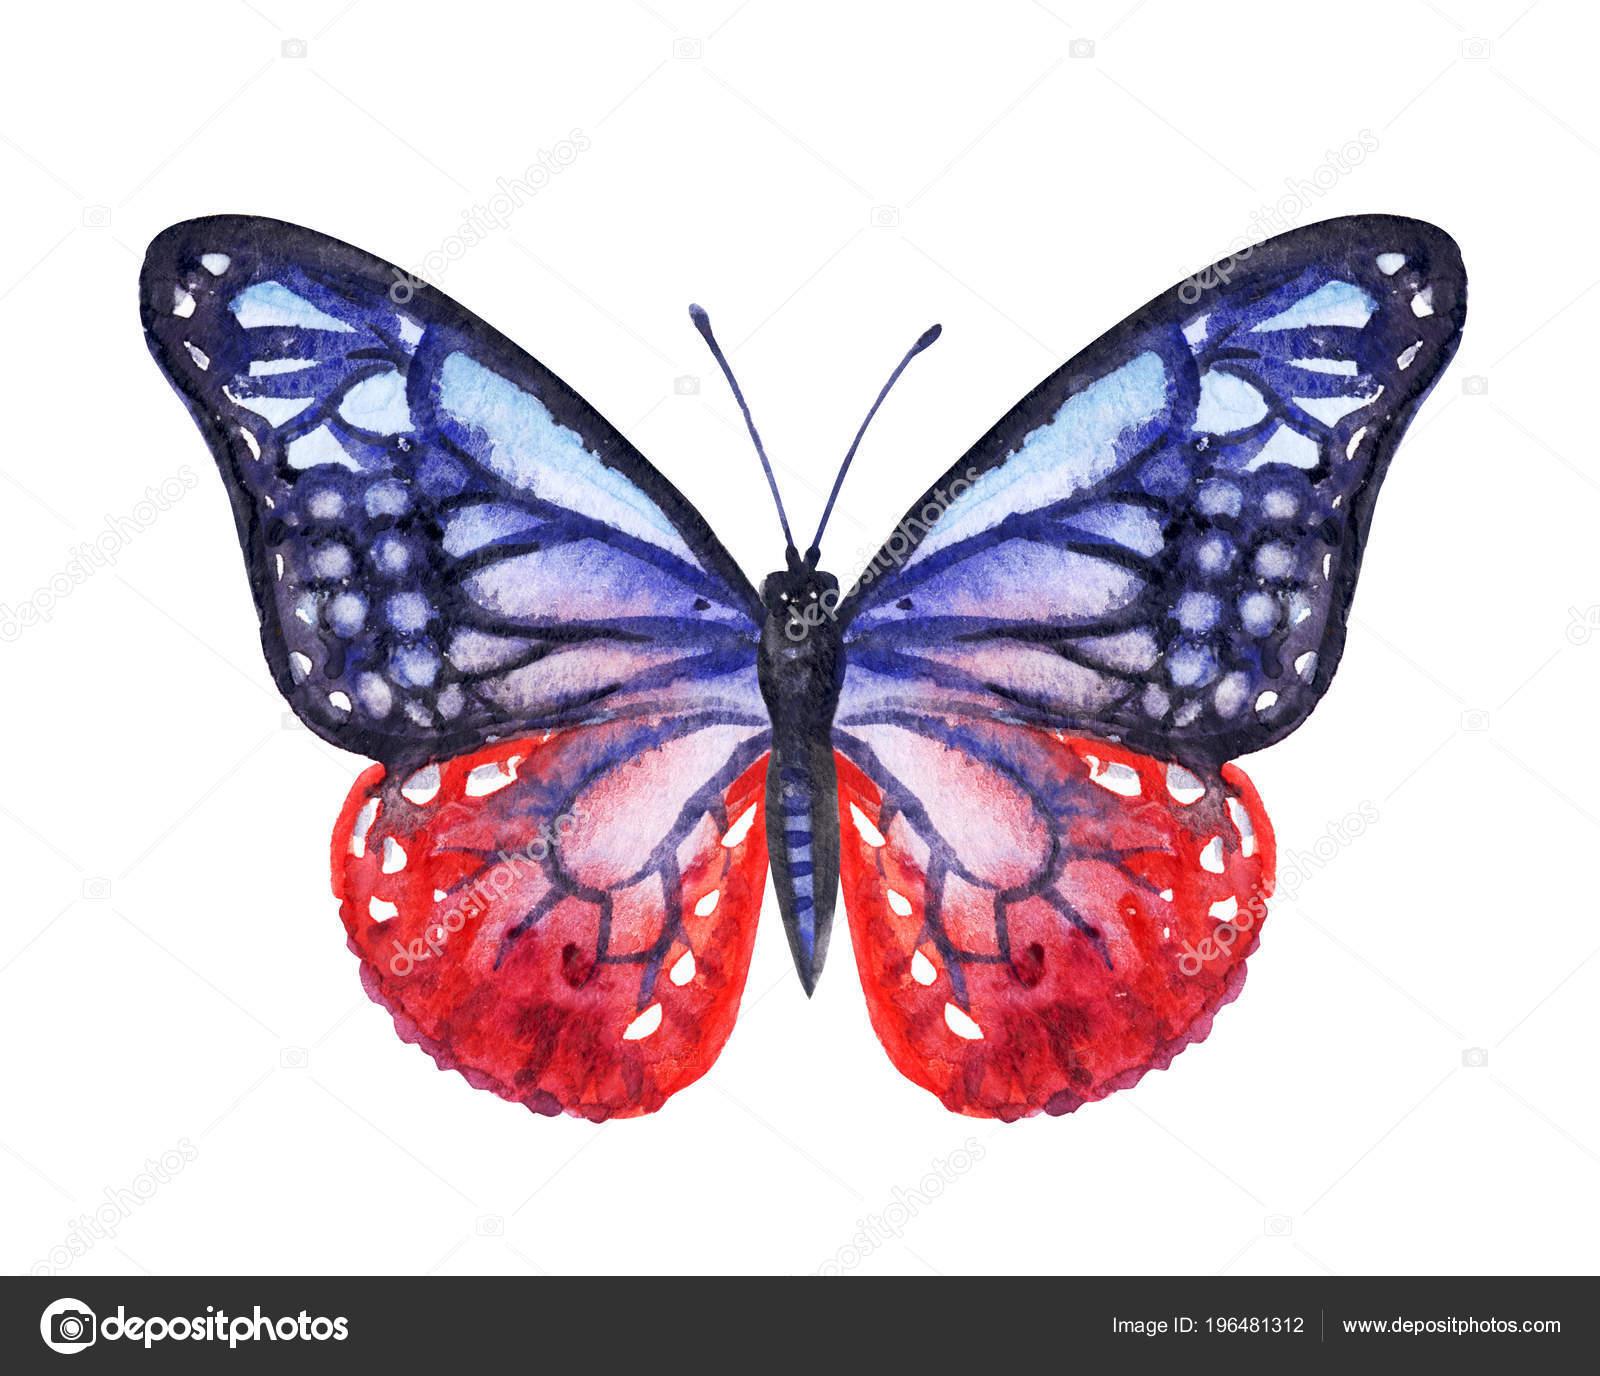 Modra Cerveny Motyl Akvarel Kresba Bilem Pozadi Izolovane Stock